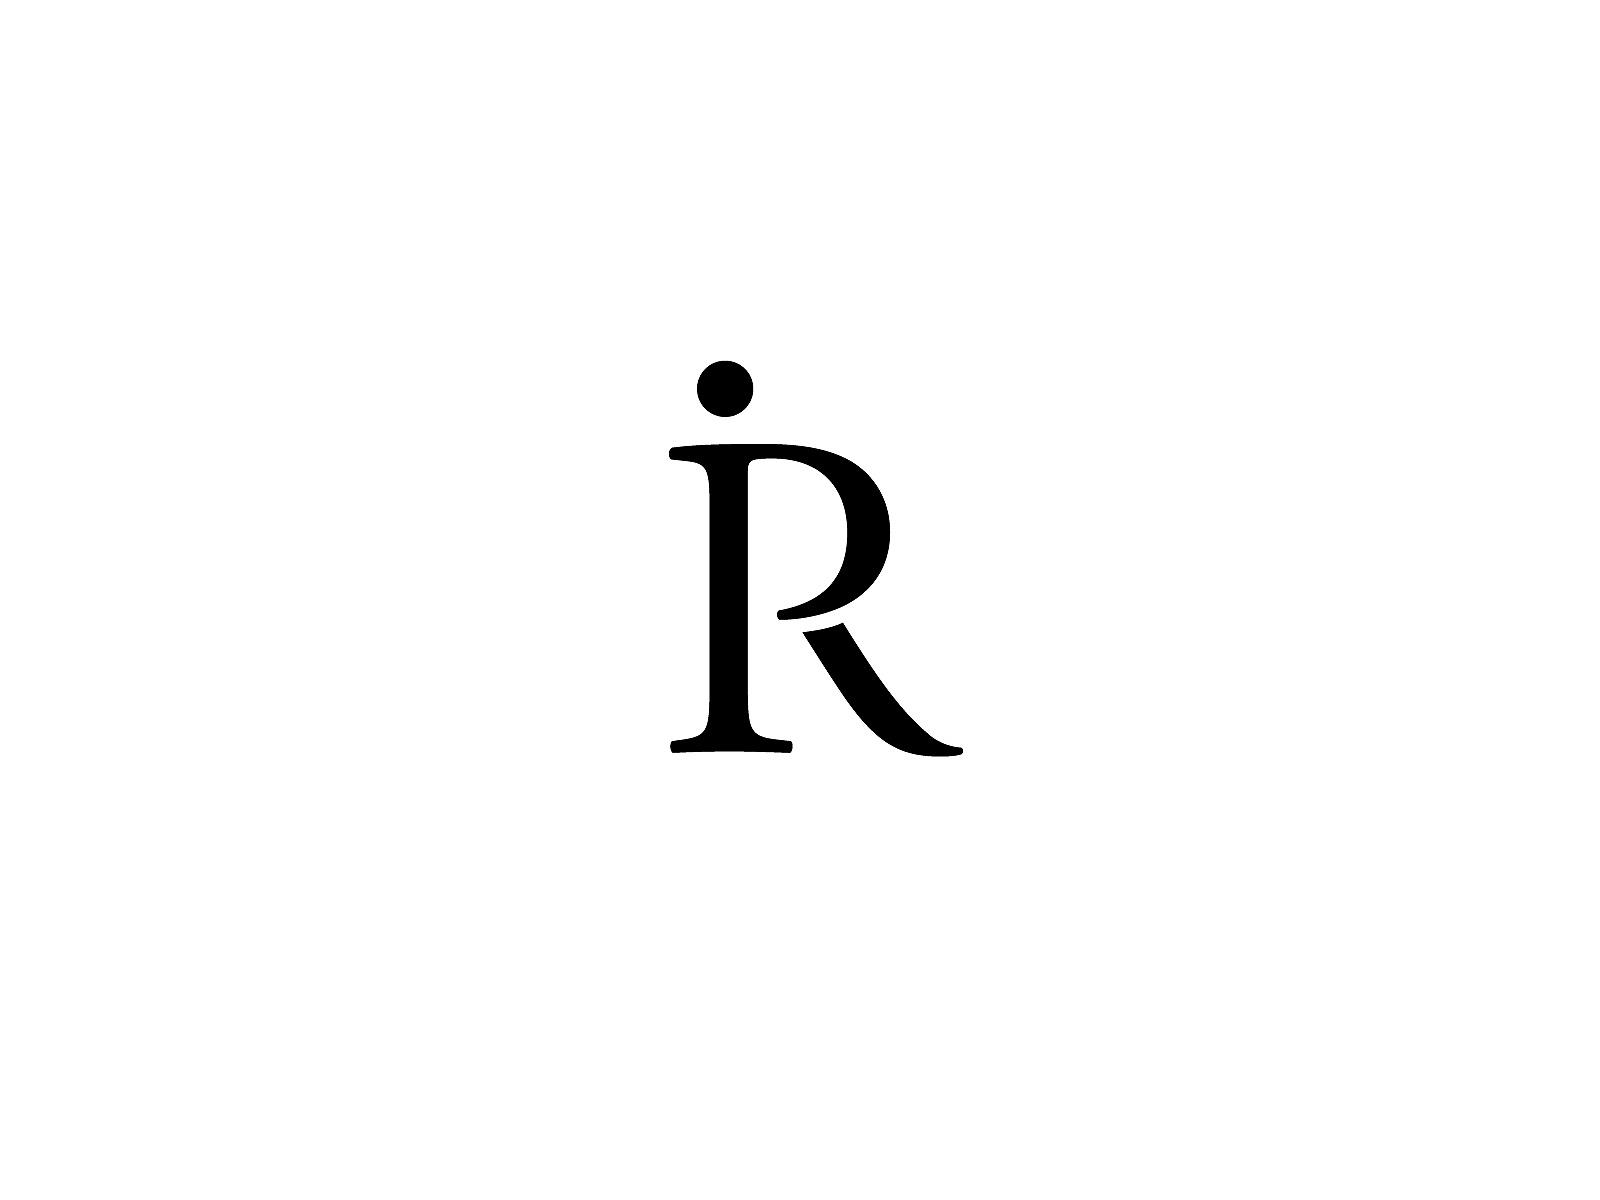 IR Monogram Logo by Tallant Design on Dribbble.